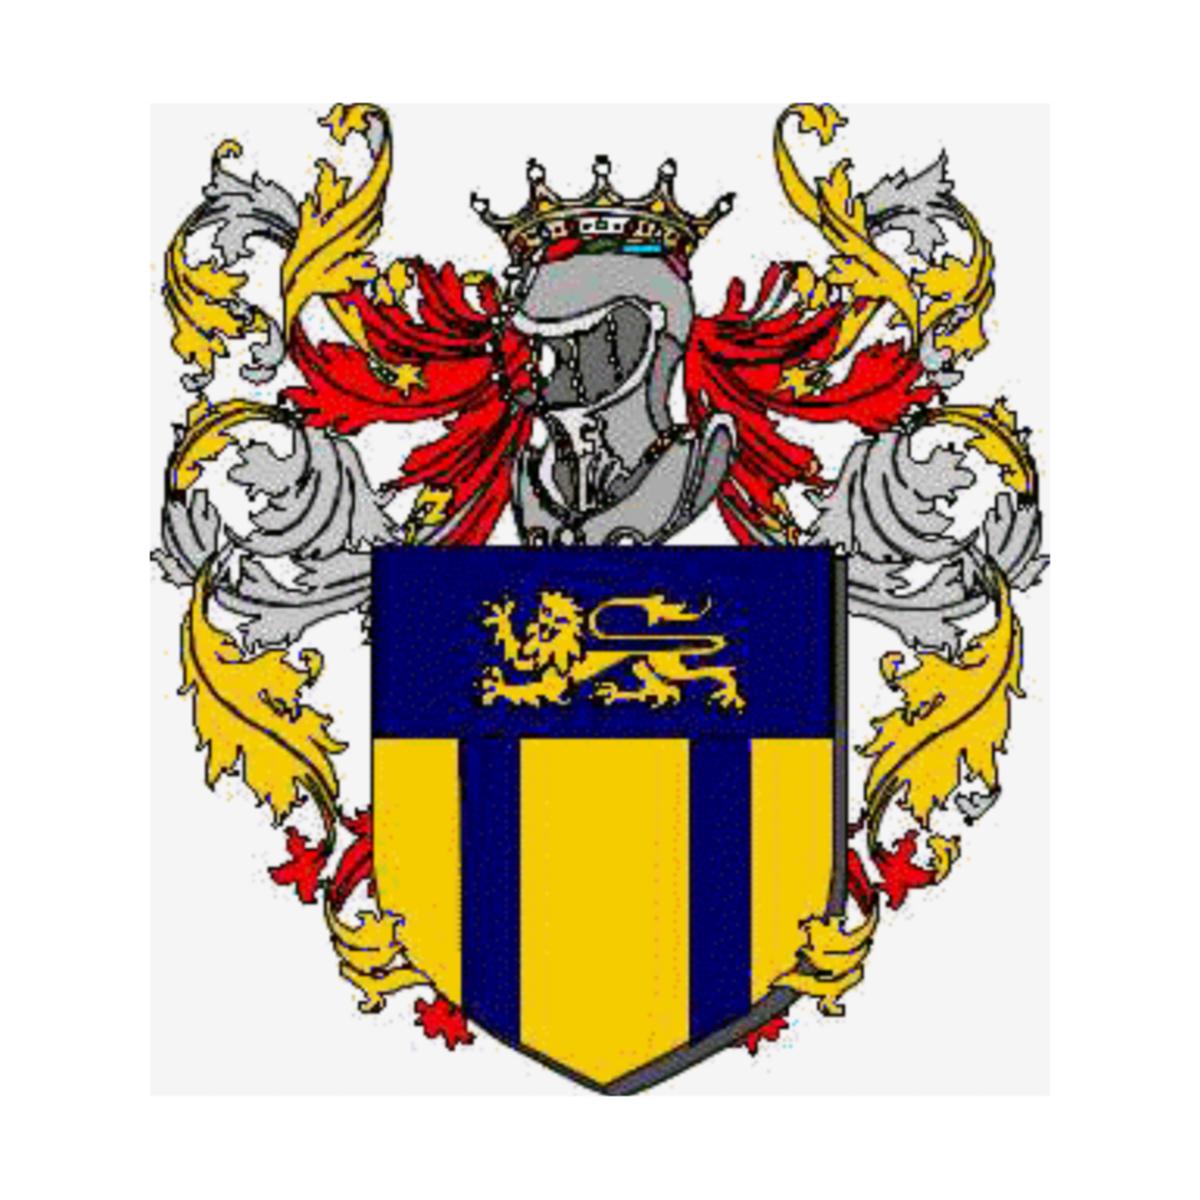 nike 5.0 free homme - Brassi (Italia)-History heraldry, coat of arms, genealogy,